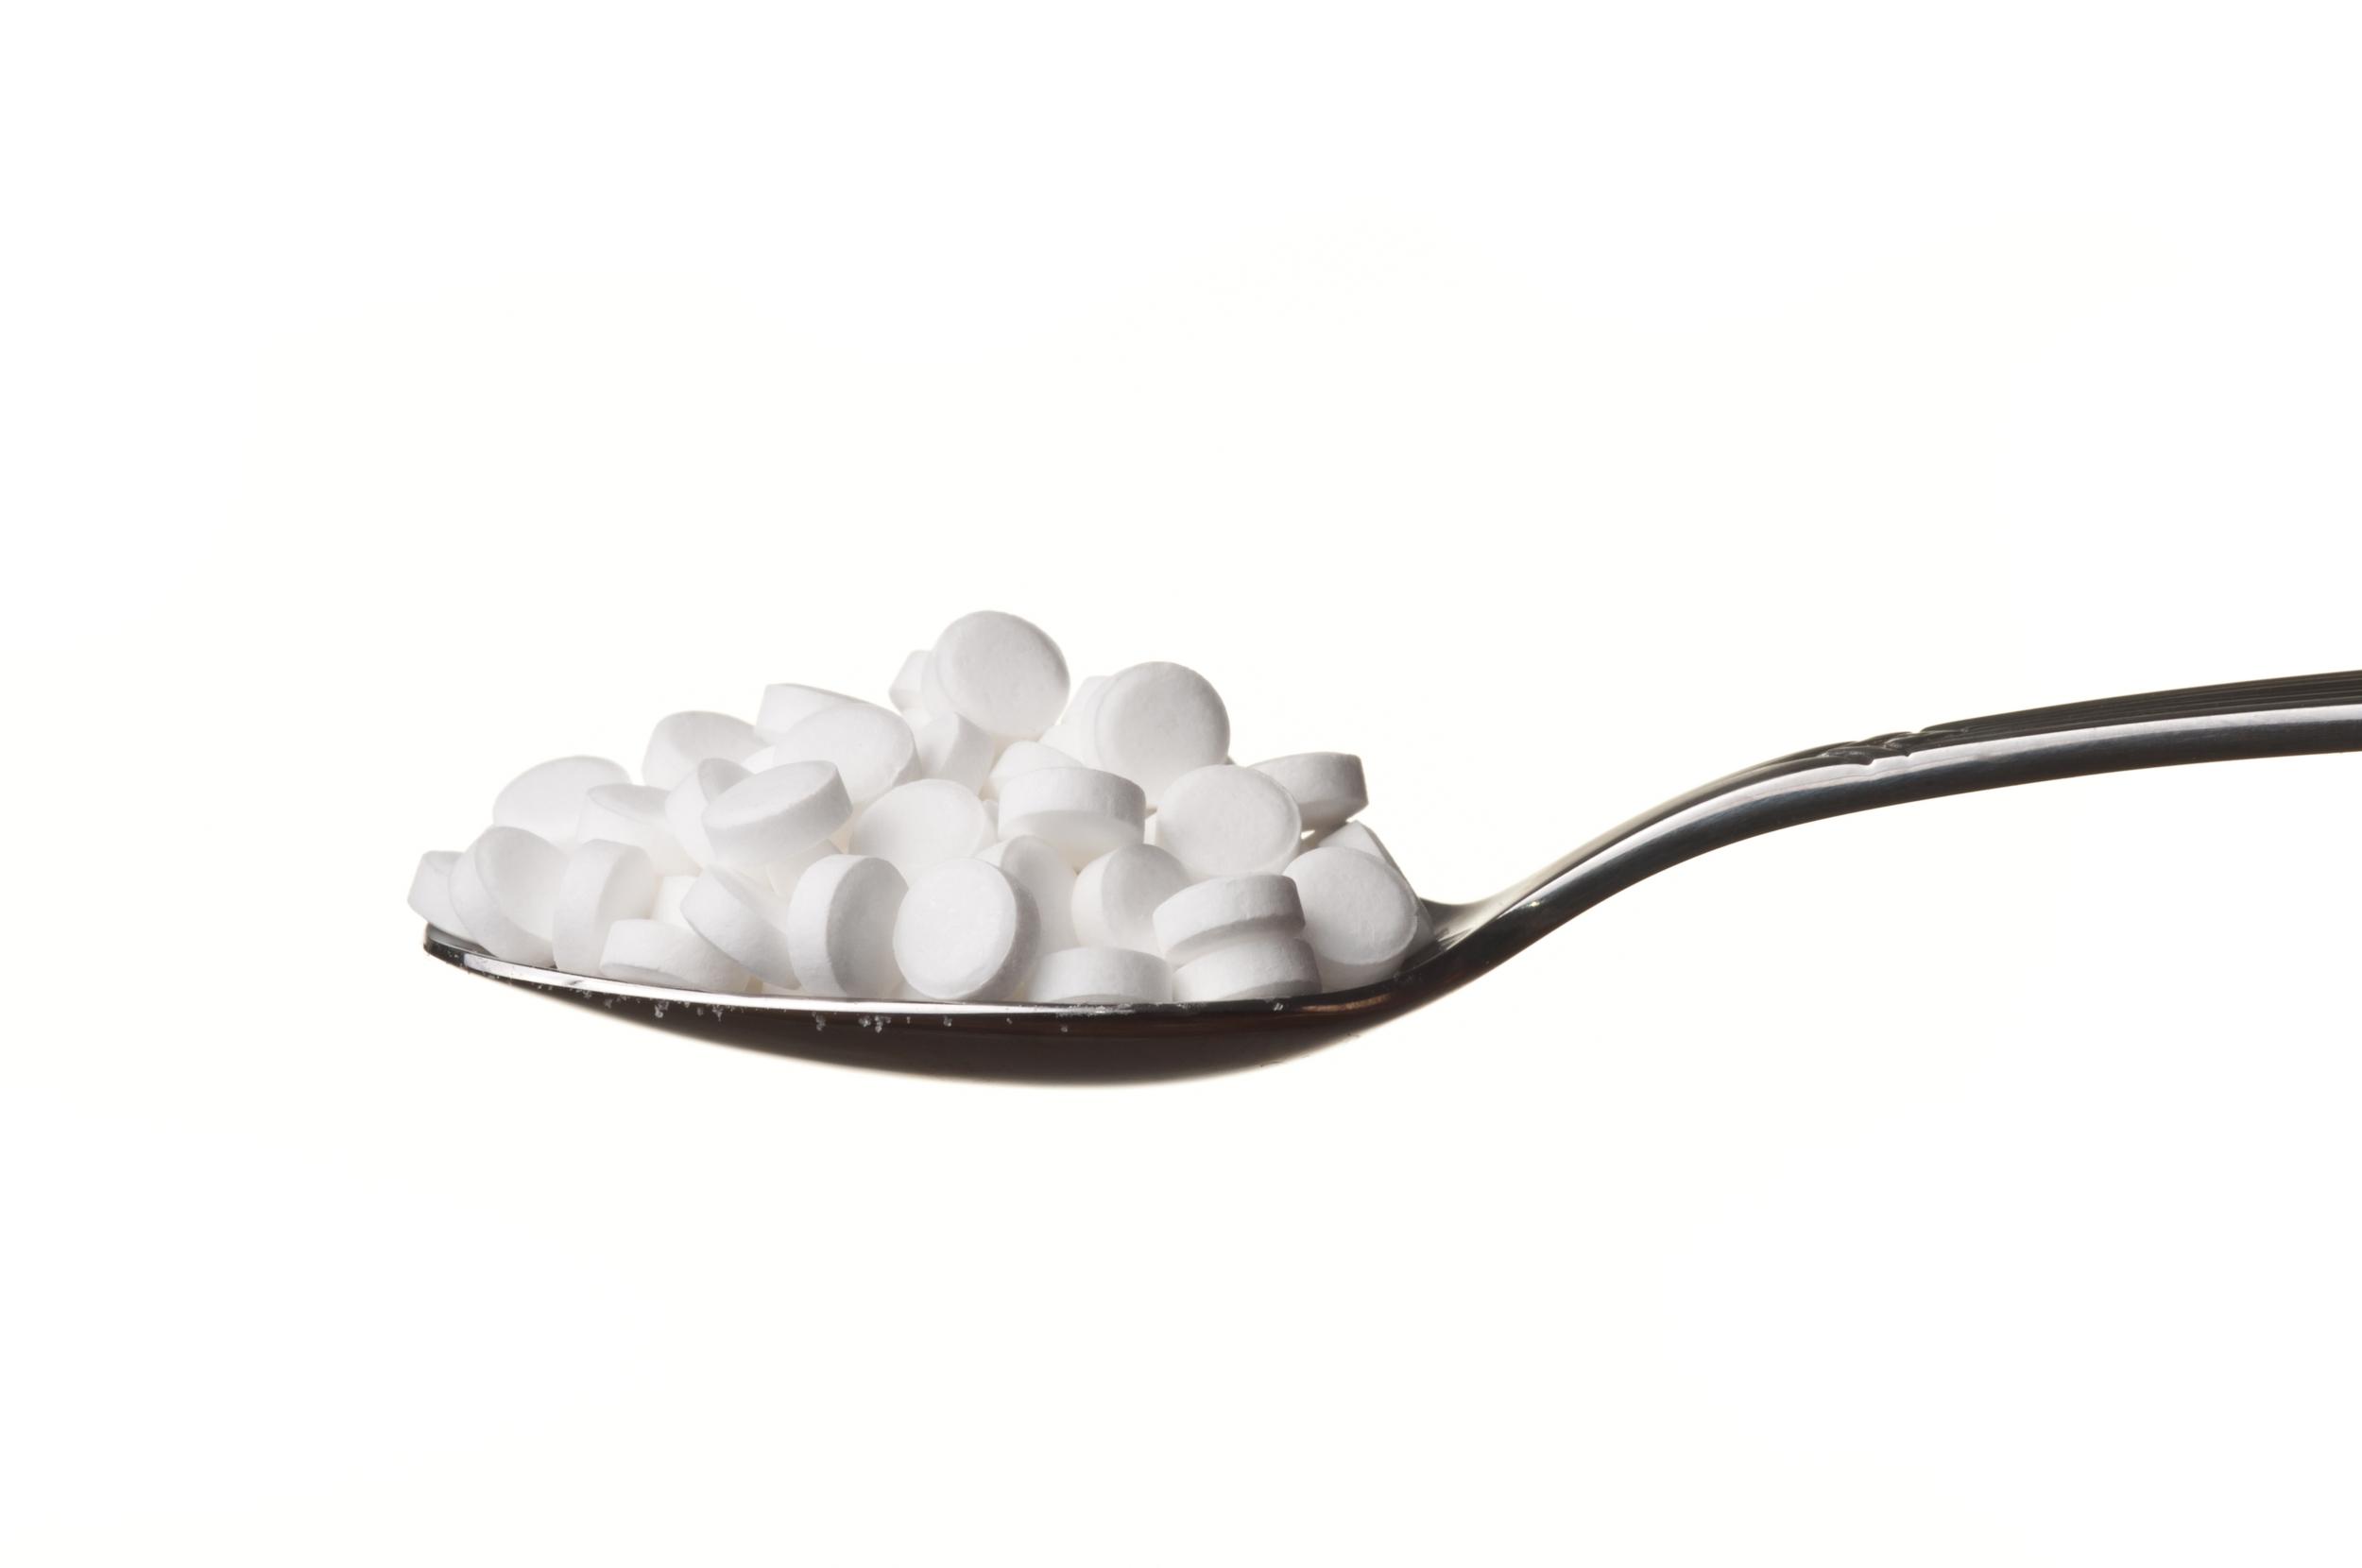 fake-sugar-spoon.jpg